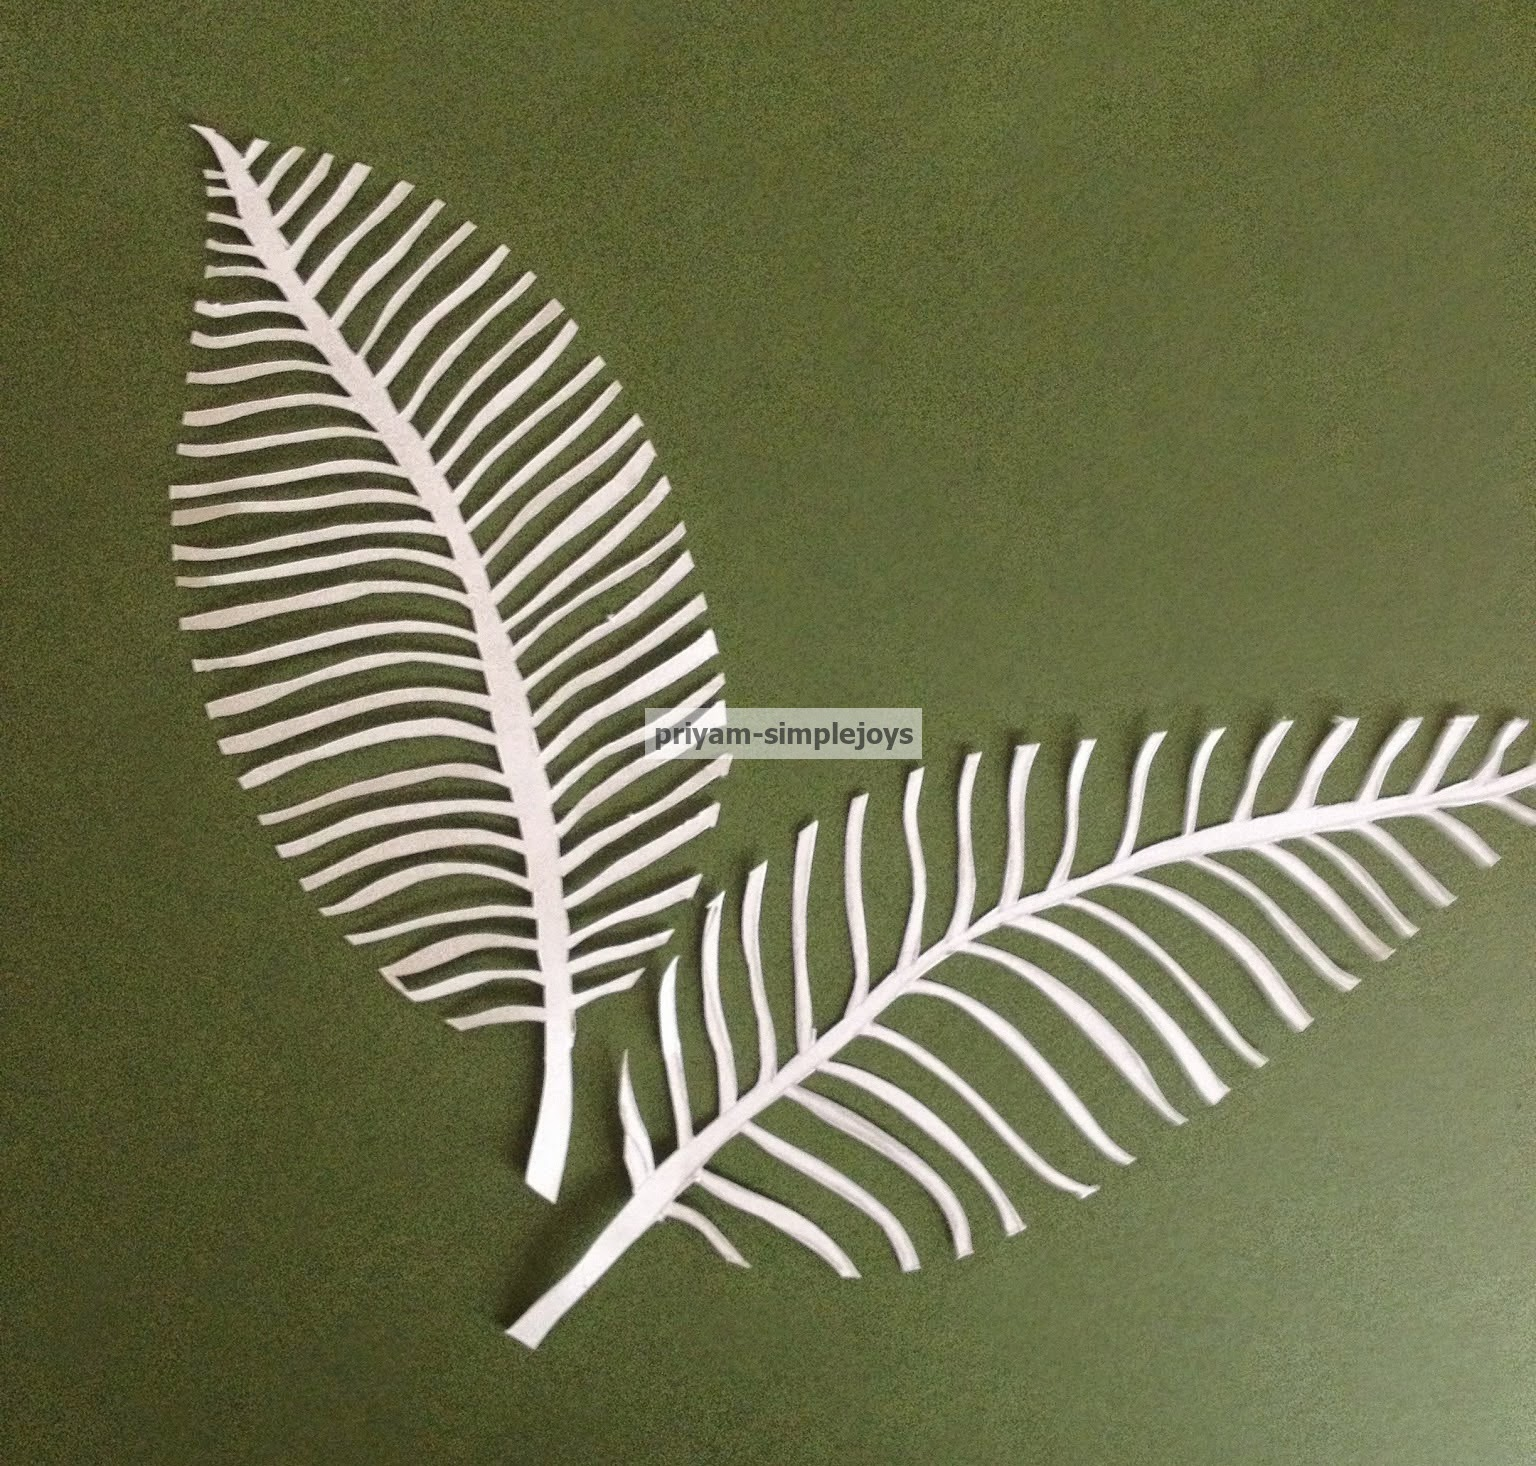 SimpleJoys: Paper Cut art